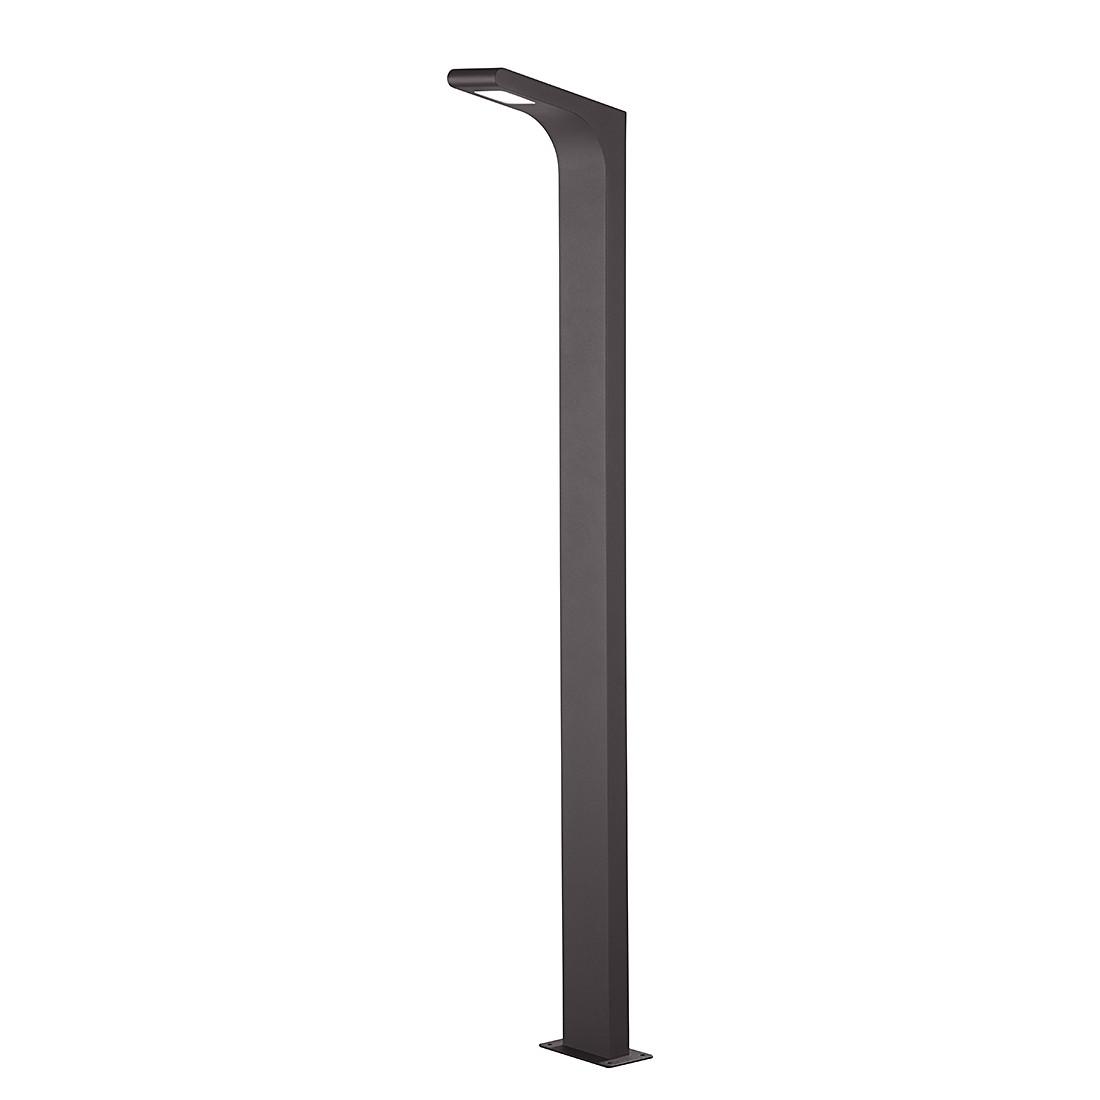 EEK A+, LED-Außenleuchte Yukon 1-flammig - Aluminium Kunststoff - Silber, Trio